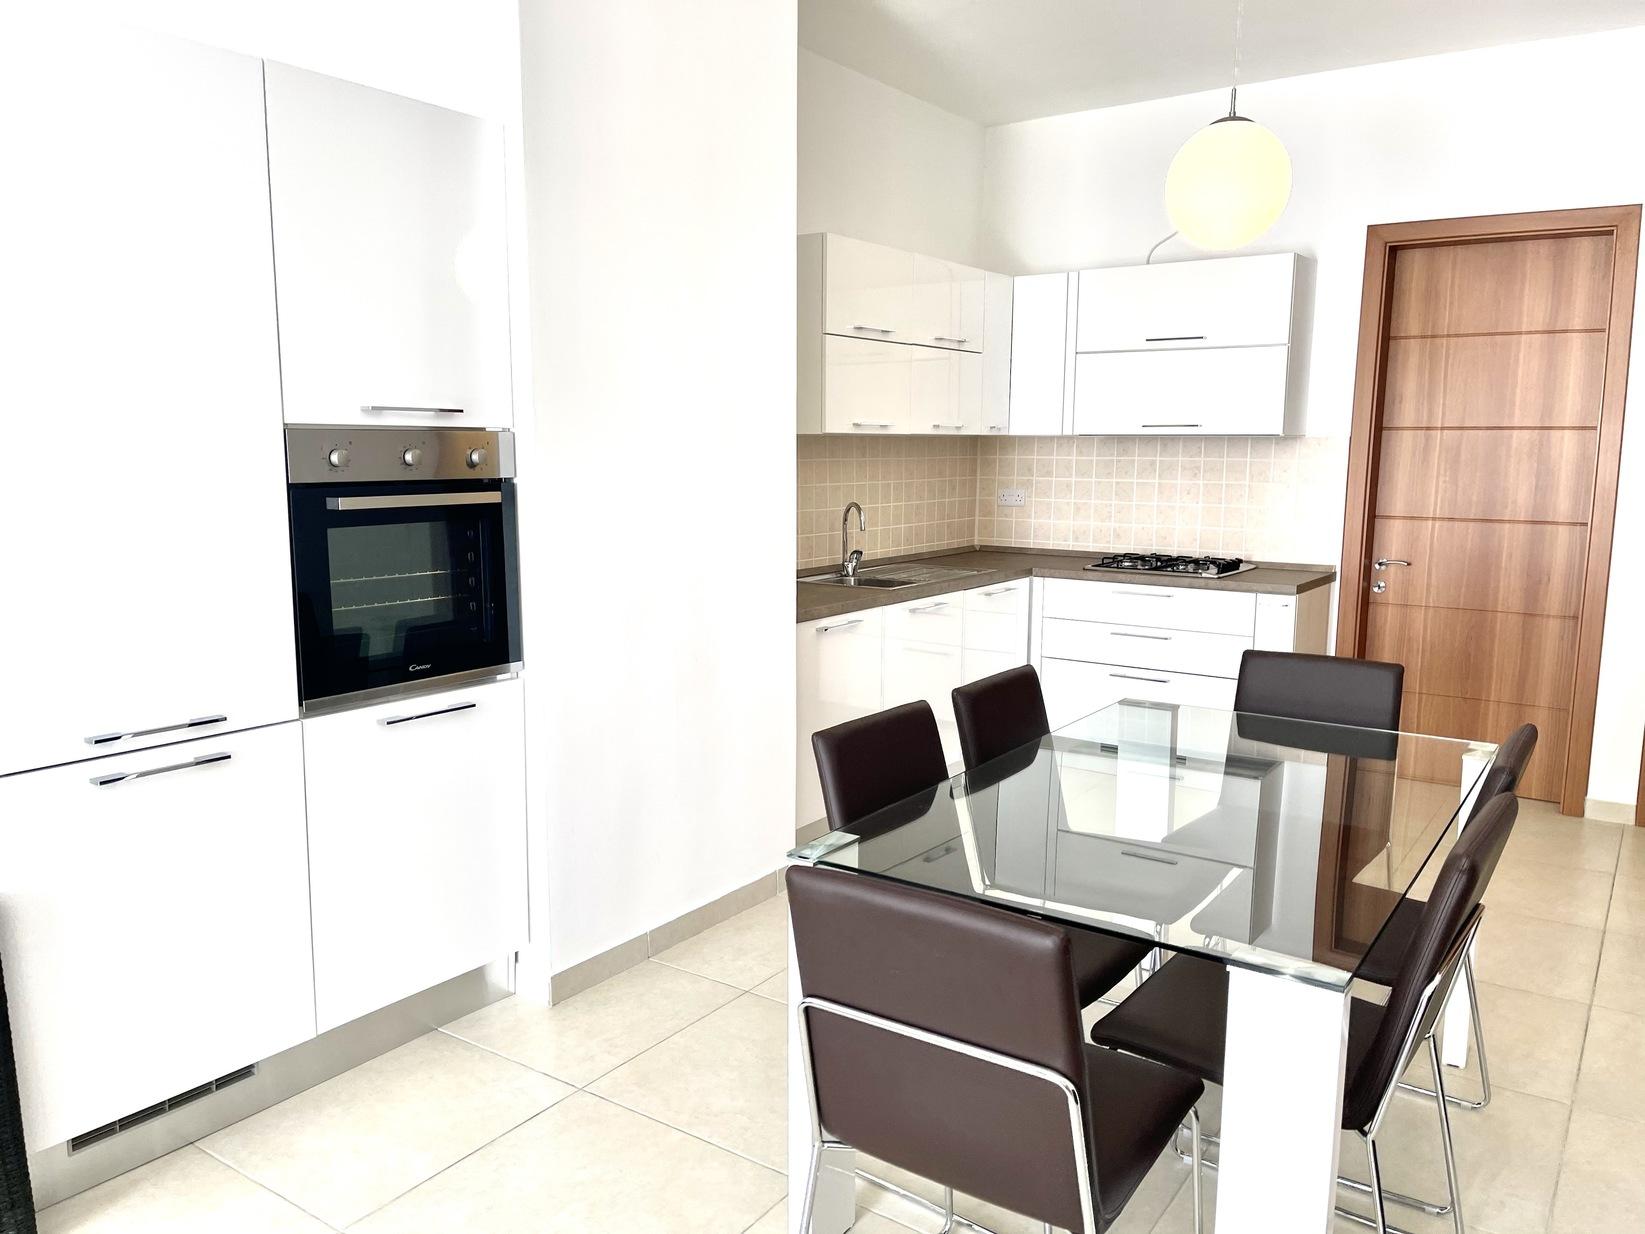 2 bed Penthouse For Rent in Gzira, Gzira - thumb 4